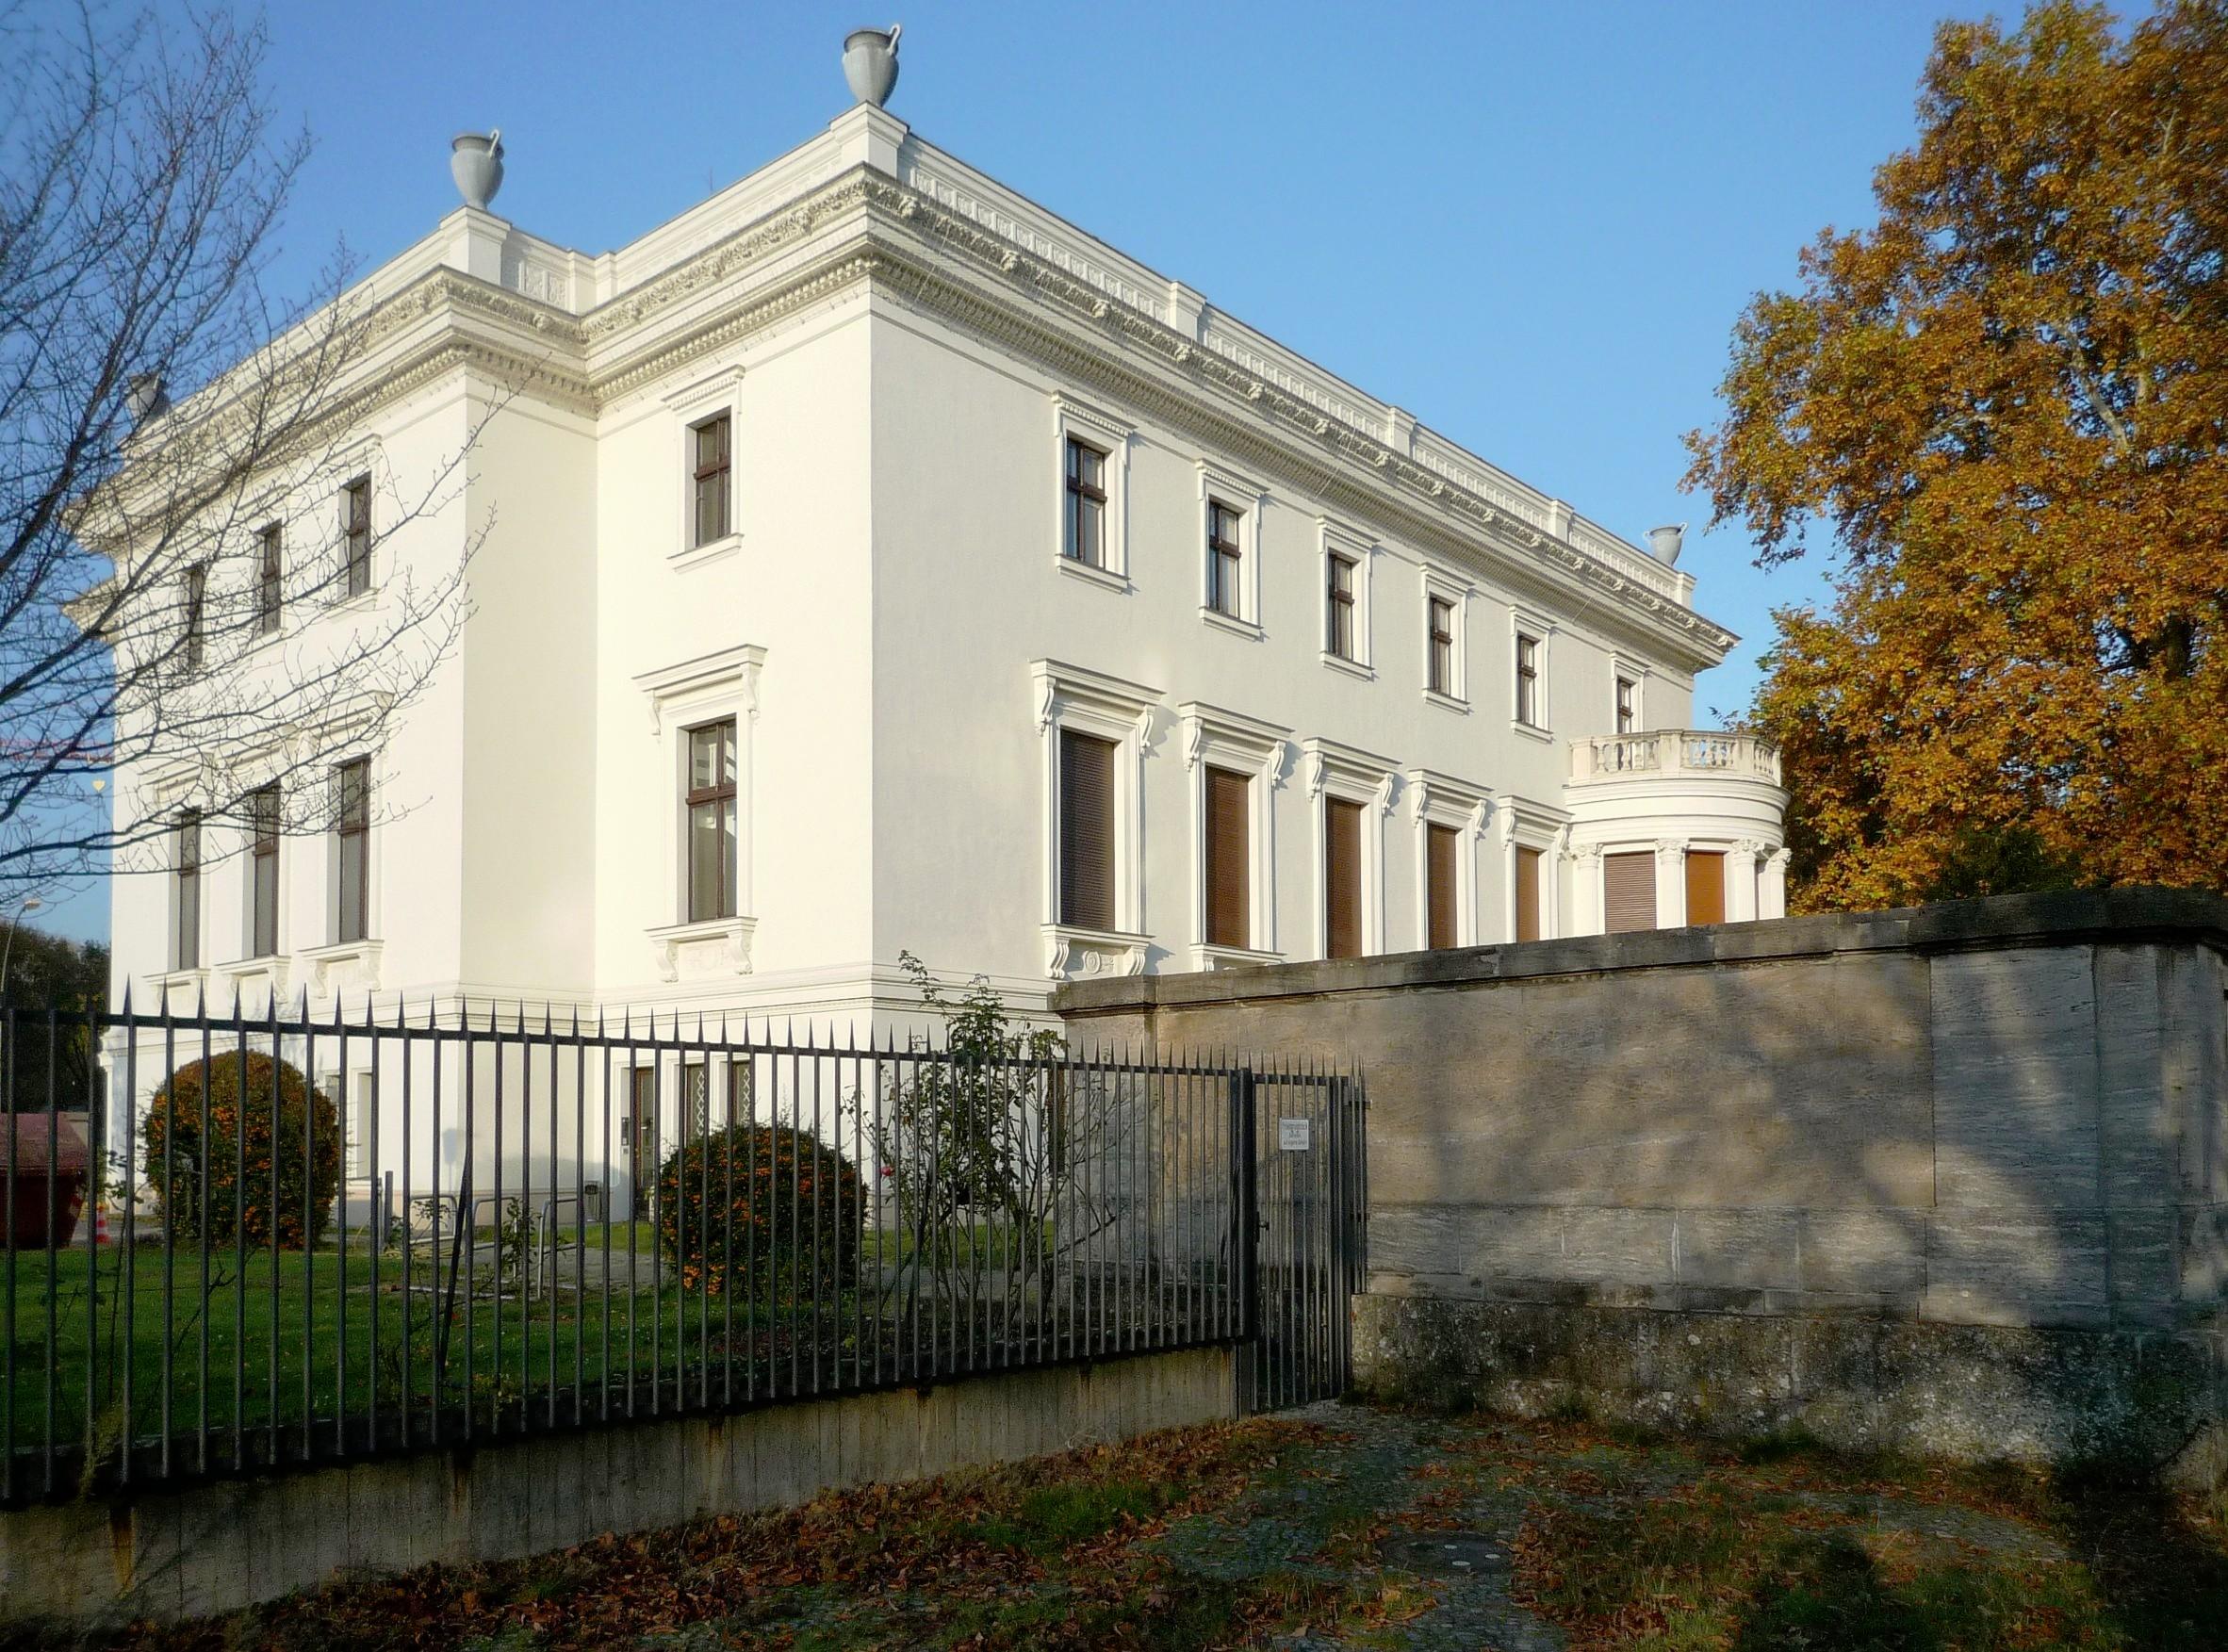 Villa Berlin file villa der heydt berlin 2 jpg wikimedia commons